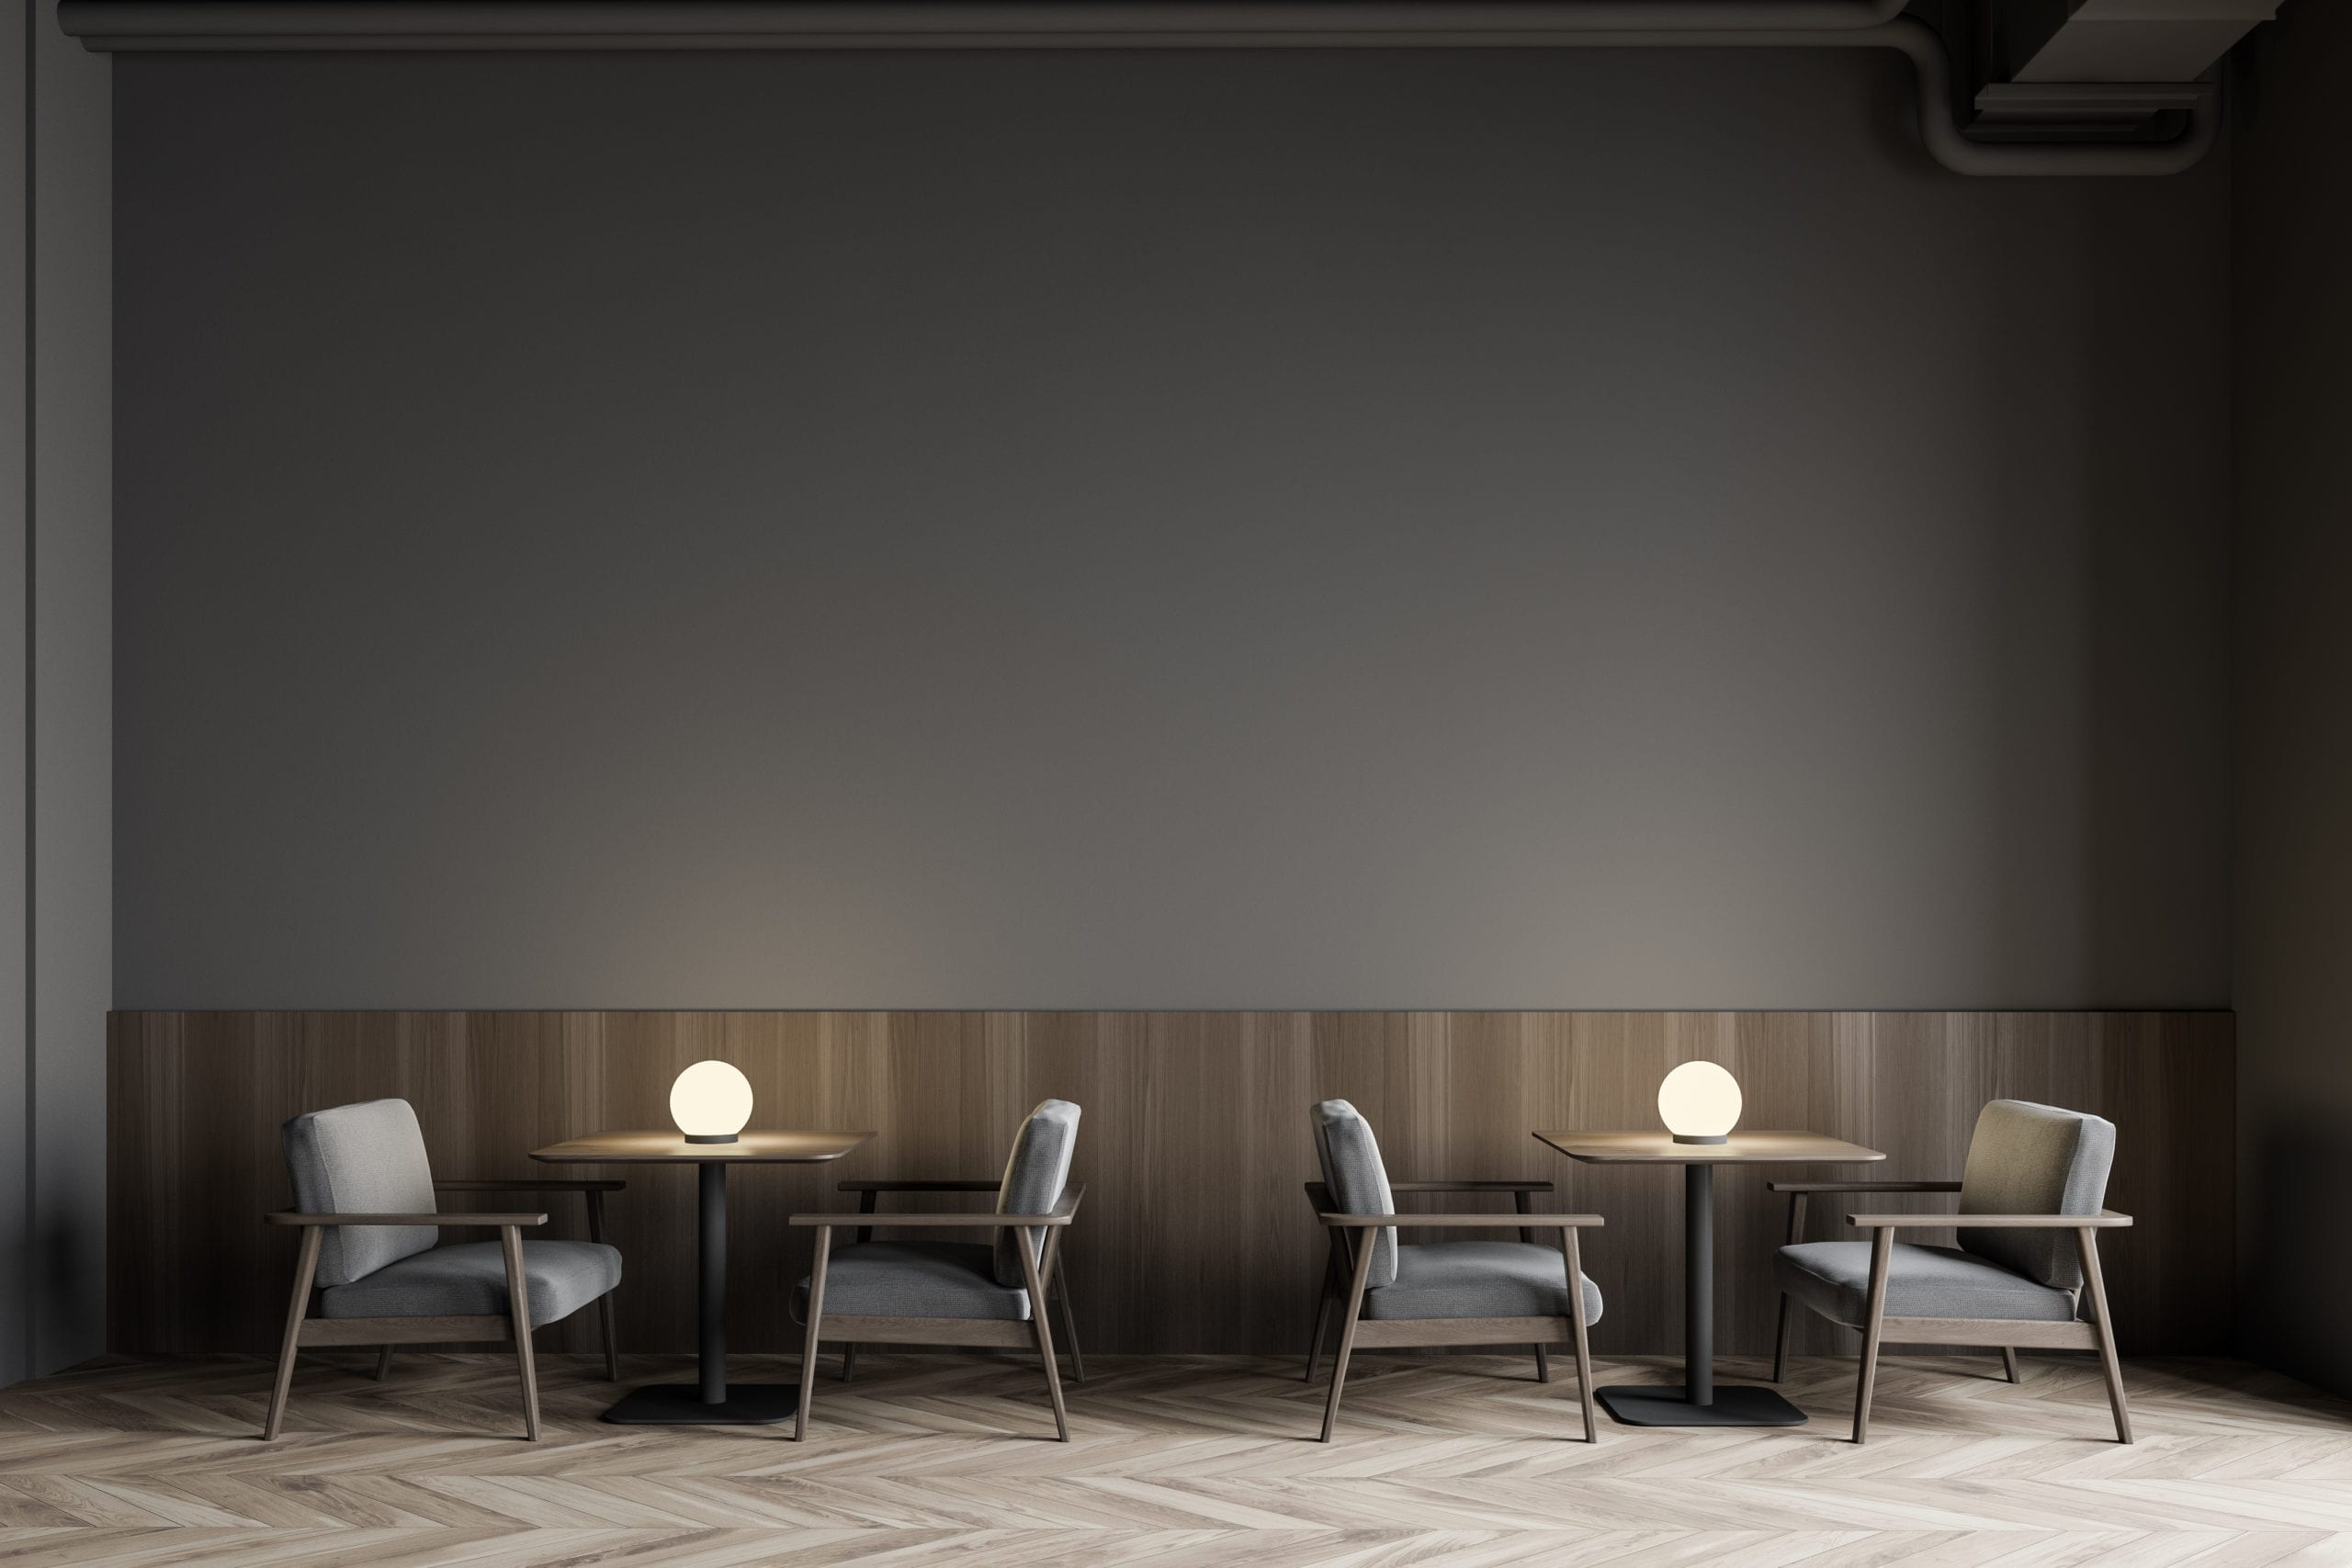 Modern Gray Restaurant Interior With Armchairs